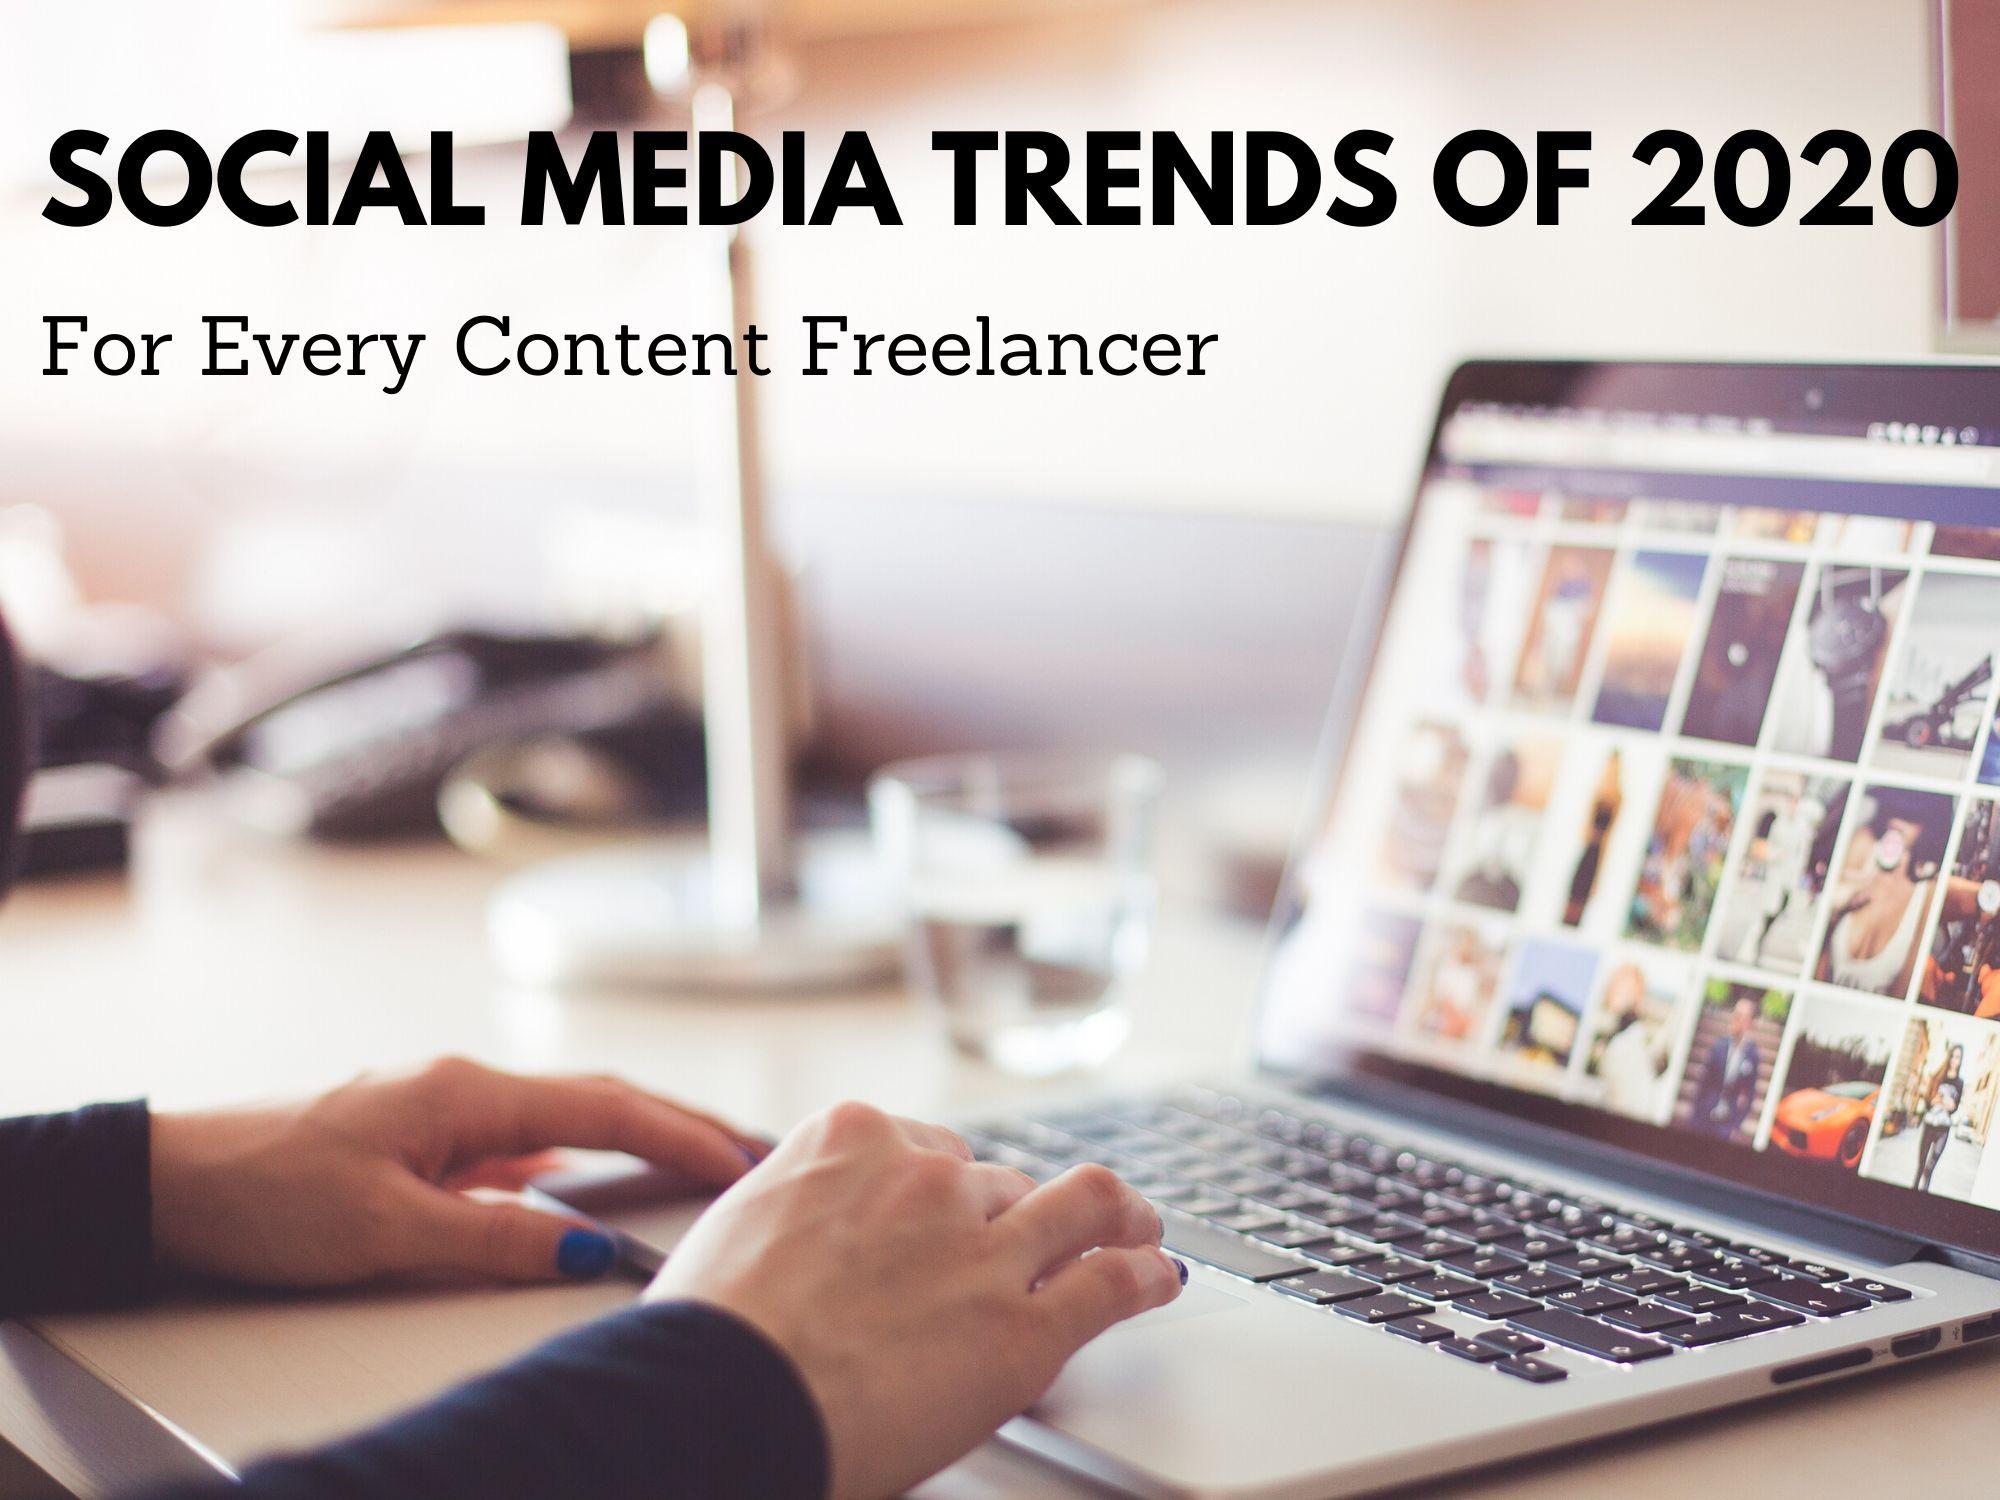 Social Media Trends of 2020 for Content Freelancer